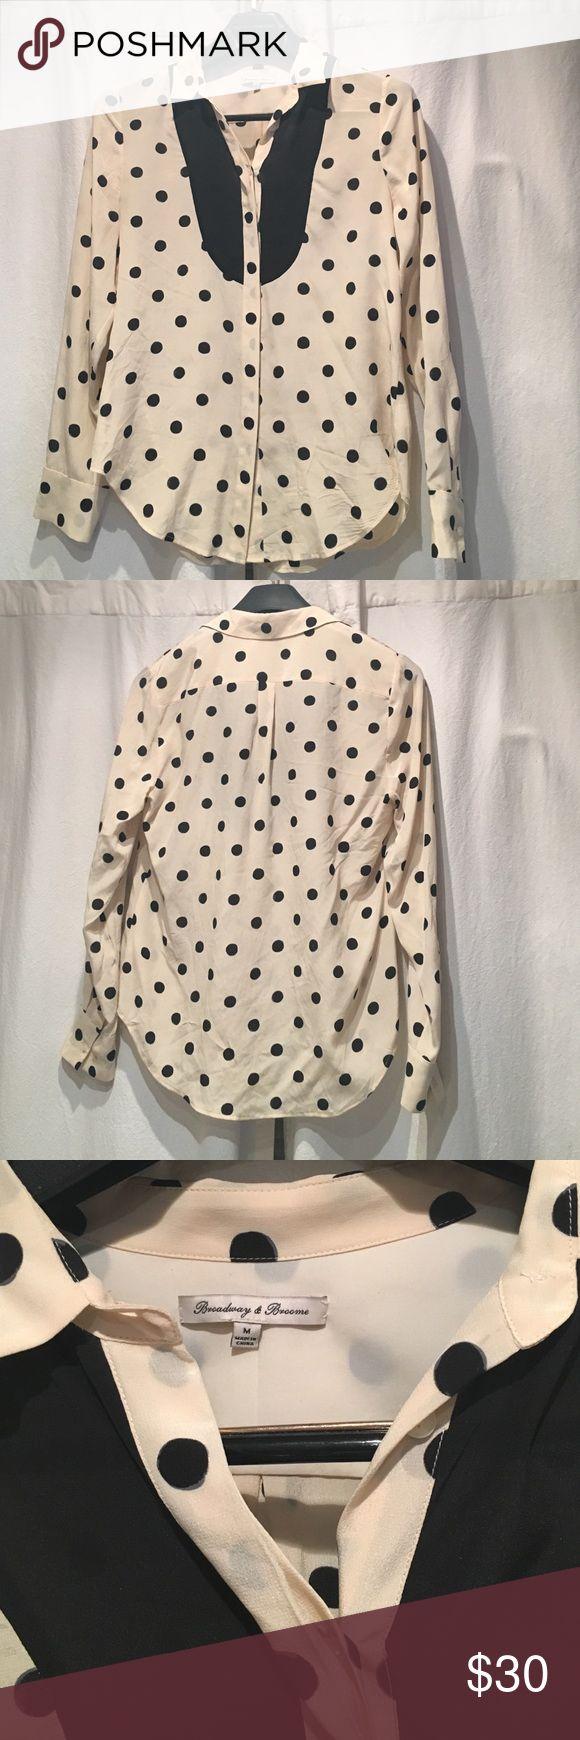 Madewell Polka Dot Tux Shirt Silk polka dot shirt from Madewell. 100% silk! Worn just a few times. Madewell Tops Blouses